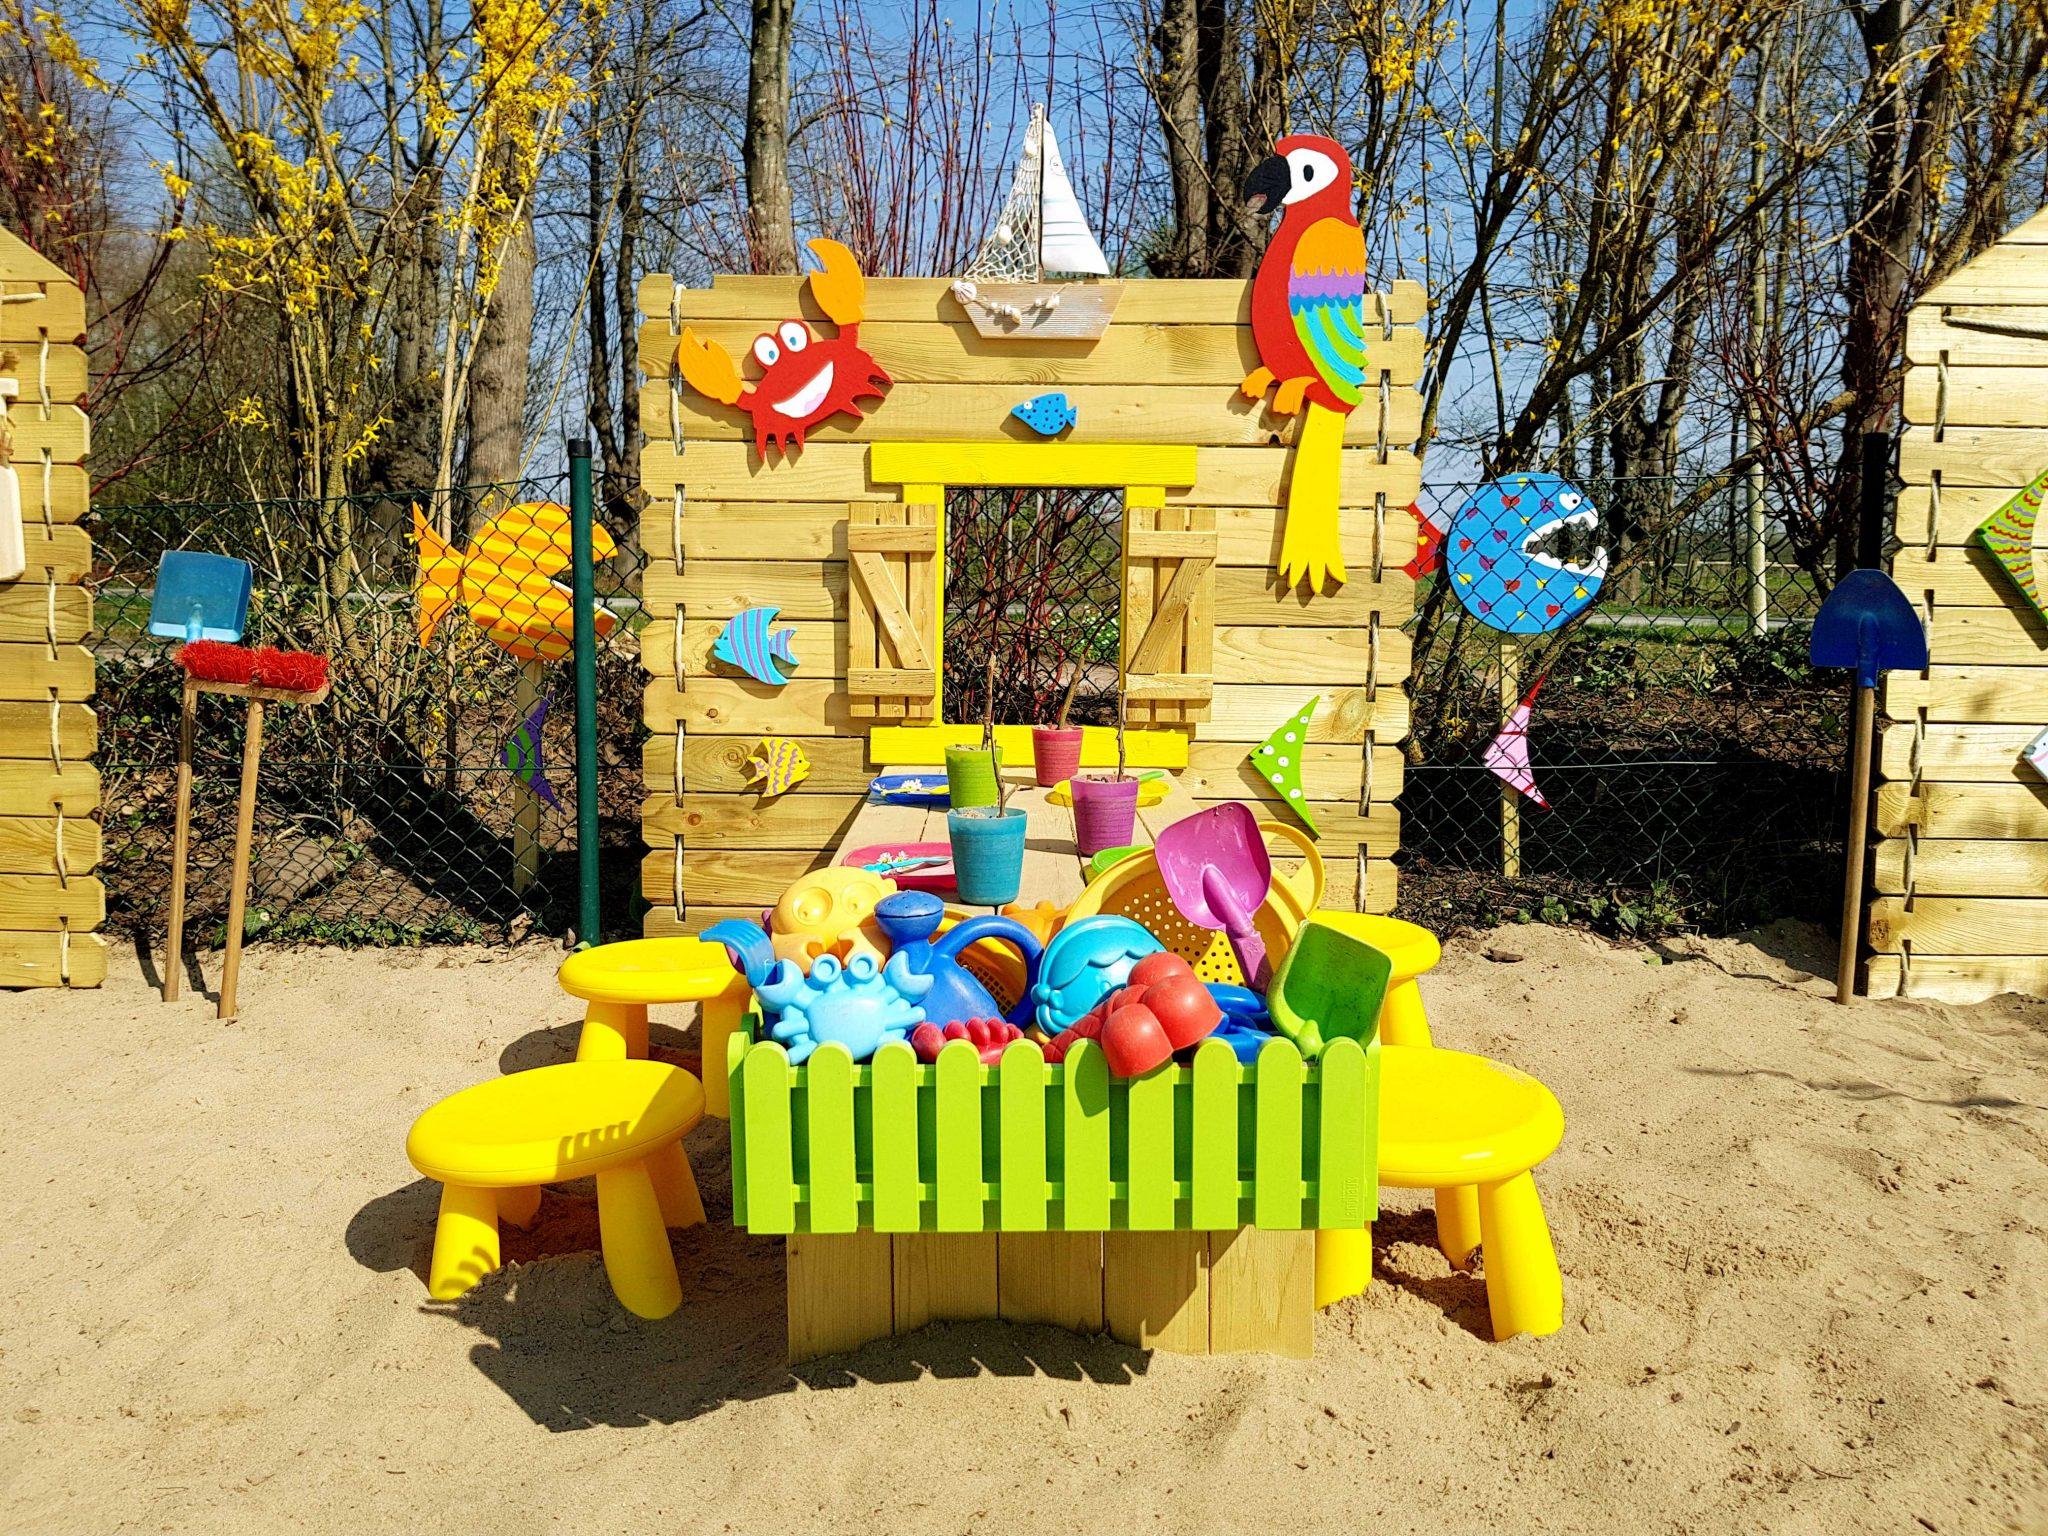 Kita Kid Zone Kinderbetreuung Garten1 20 - Kinder-Beachclub